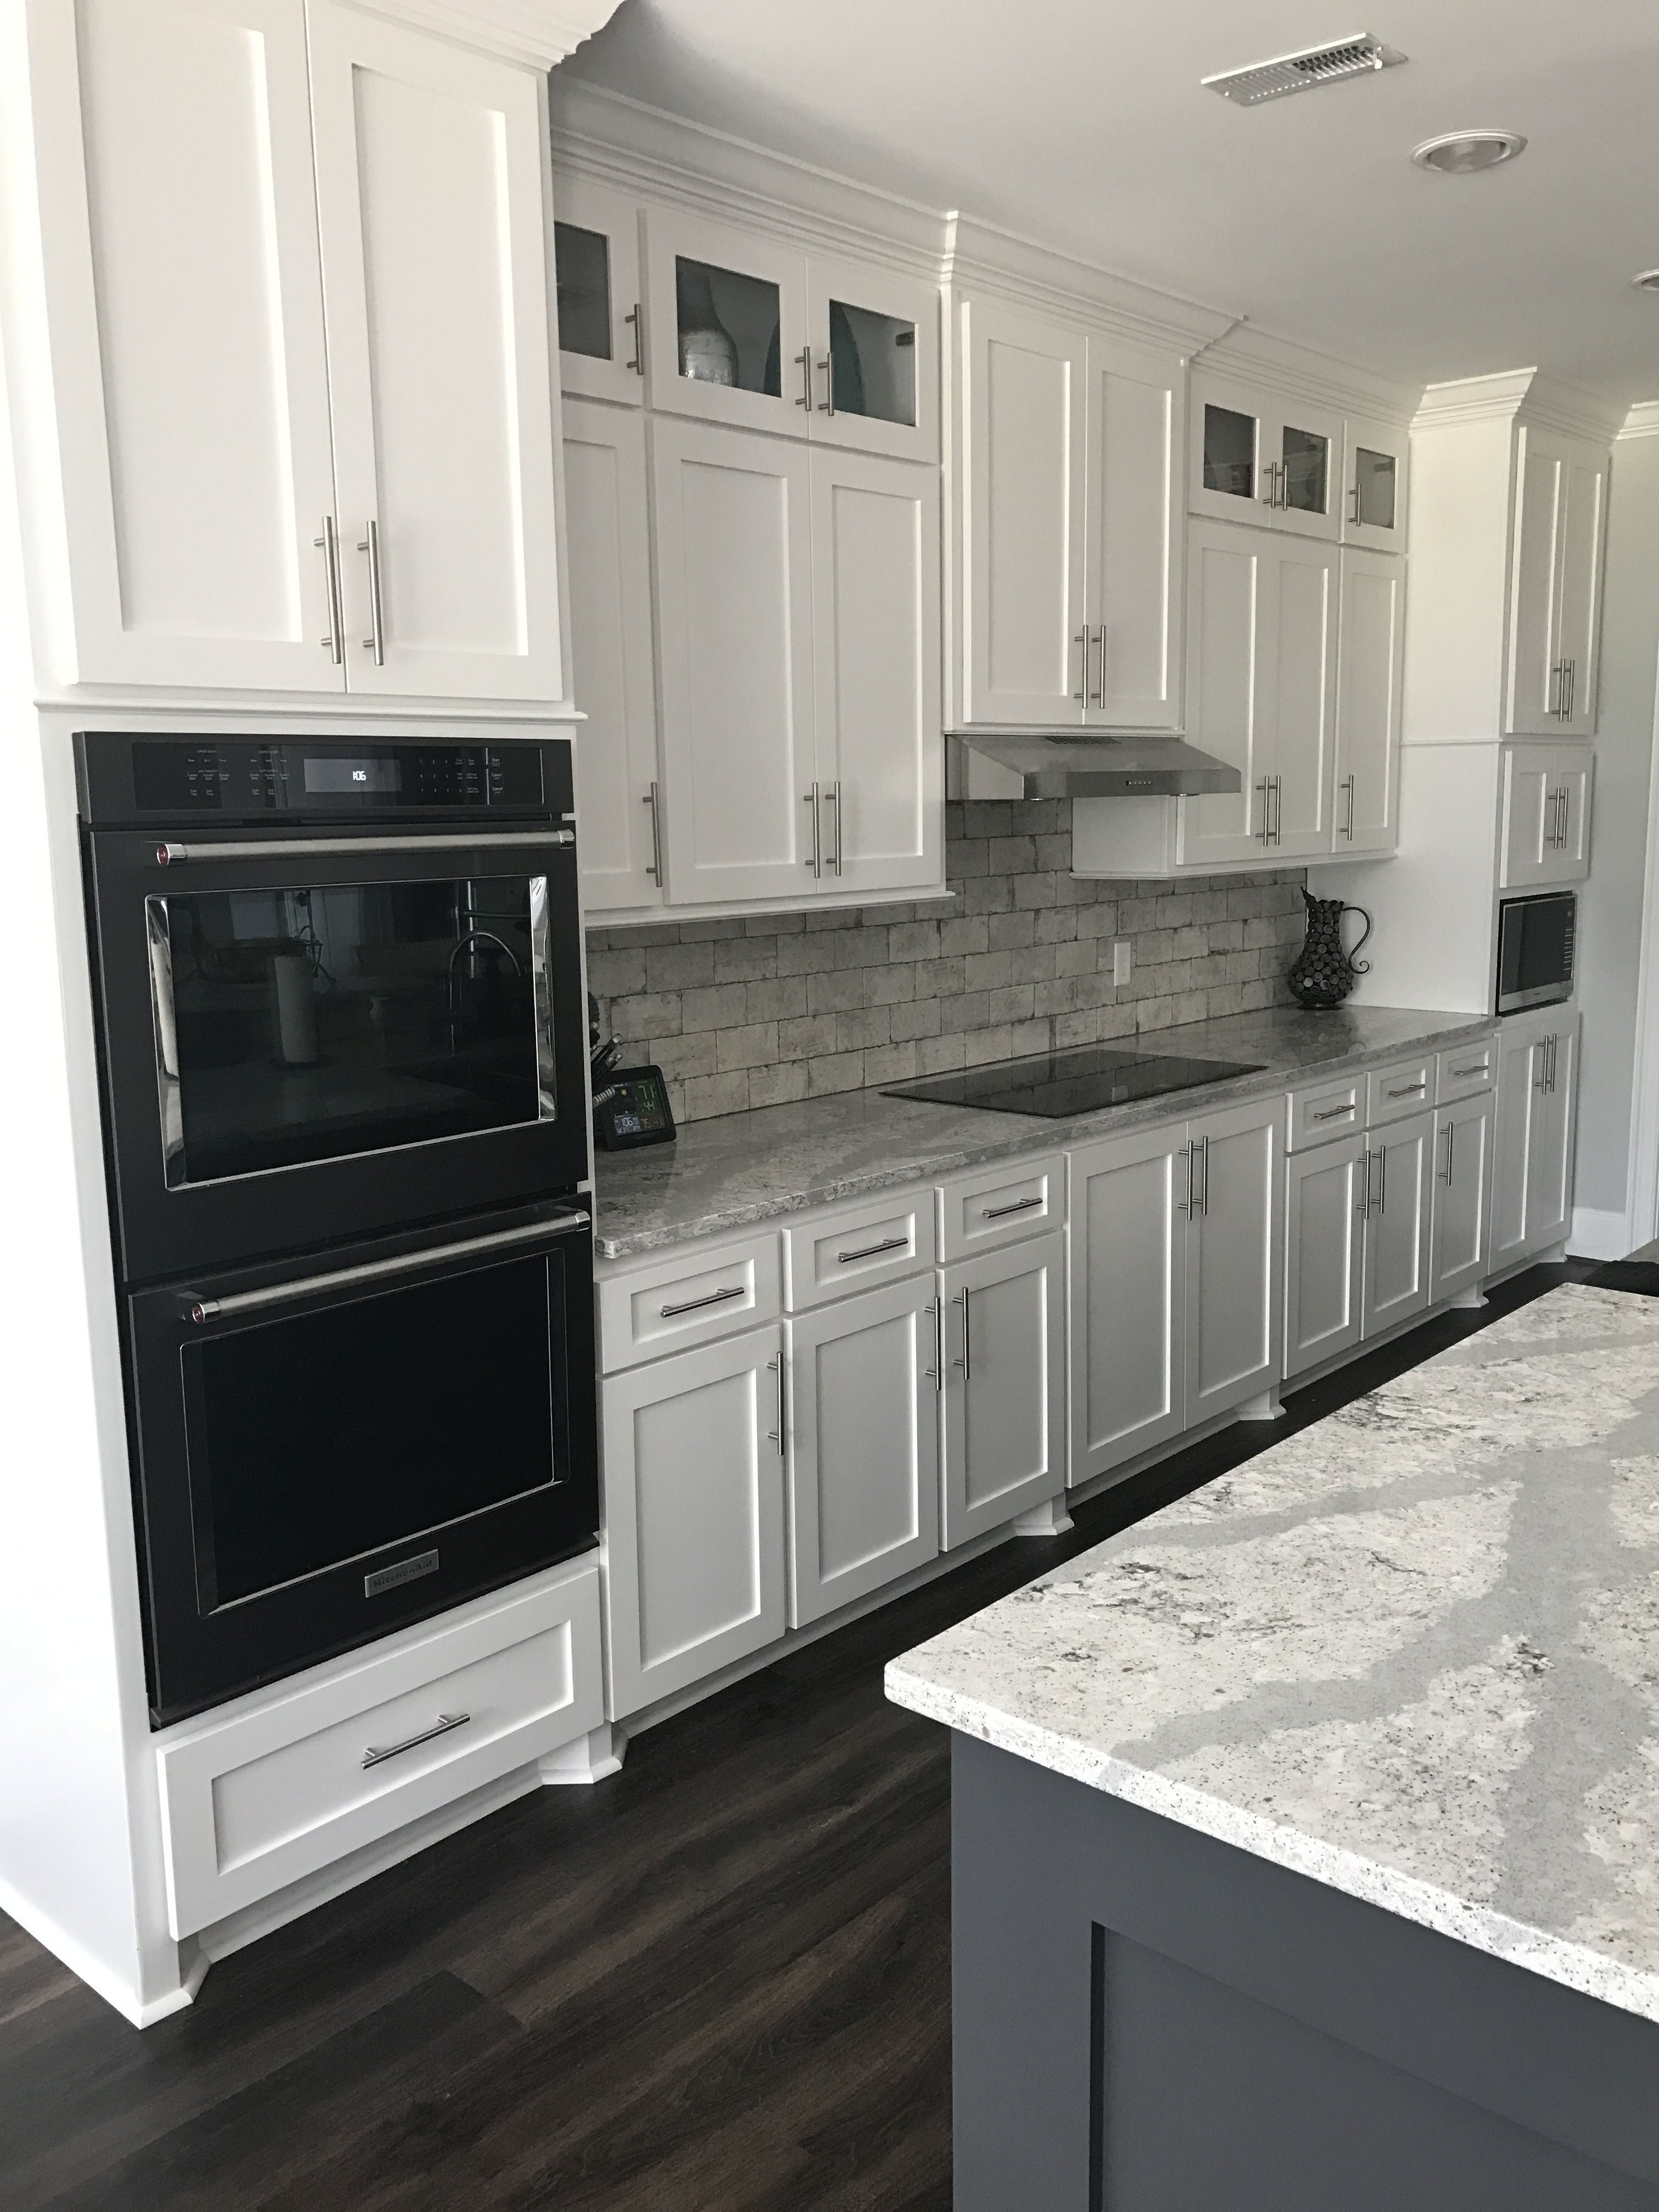 Black stainless Kitchenaid Appliances white cabinets ...